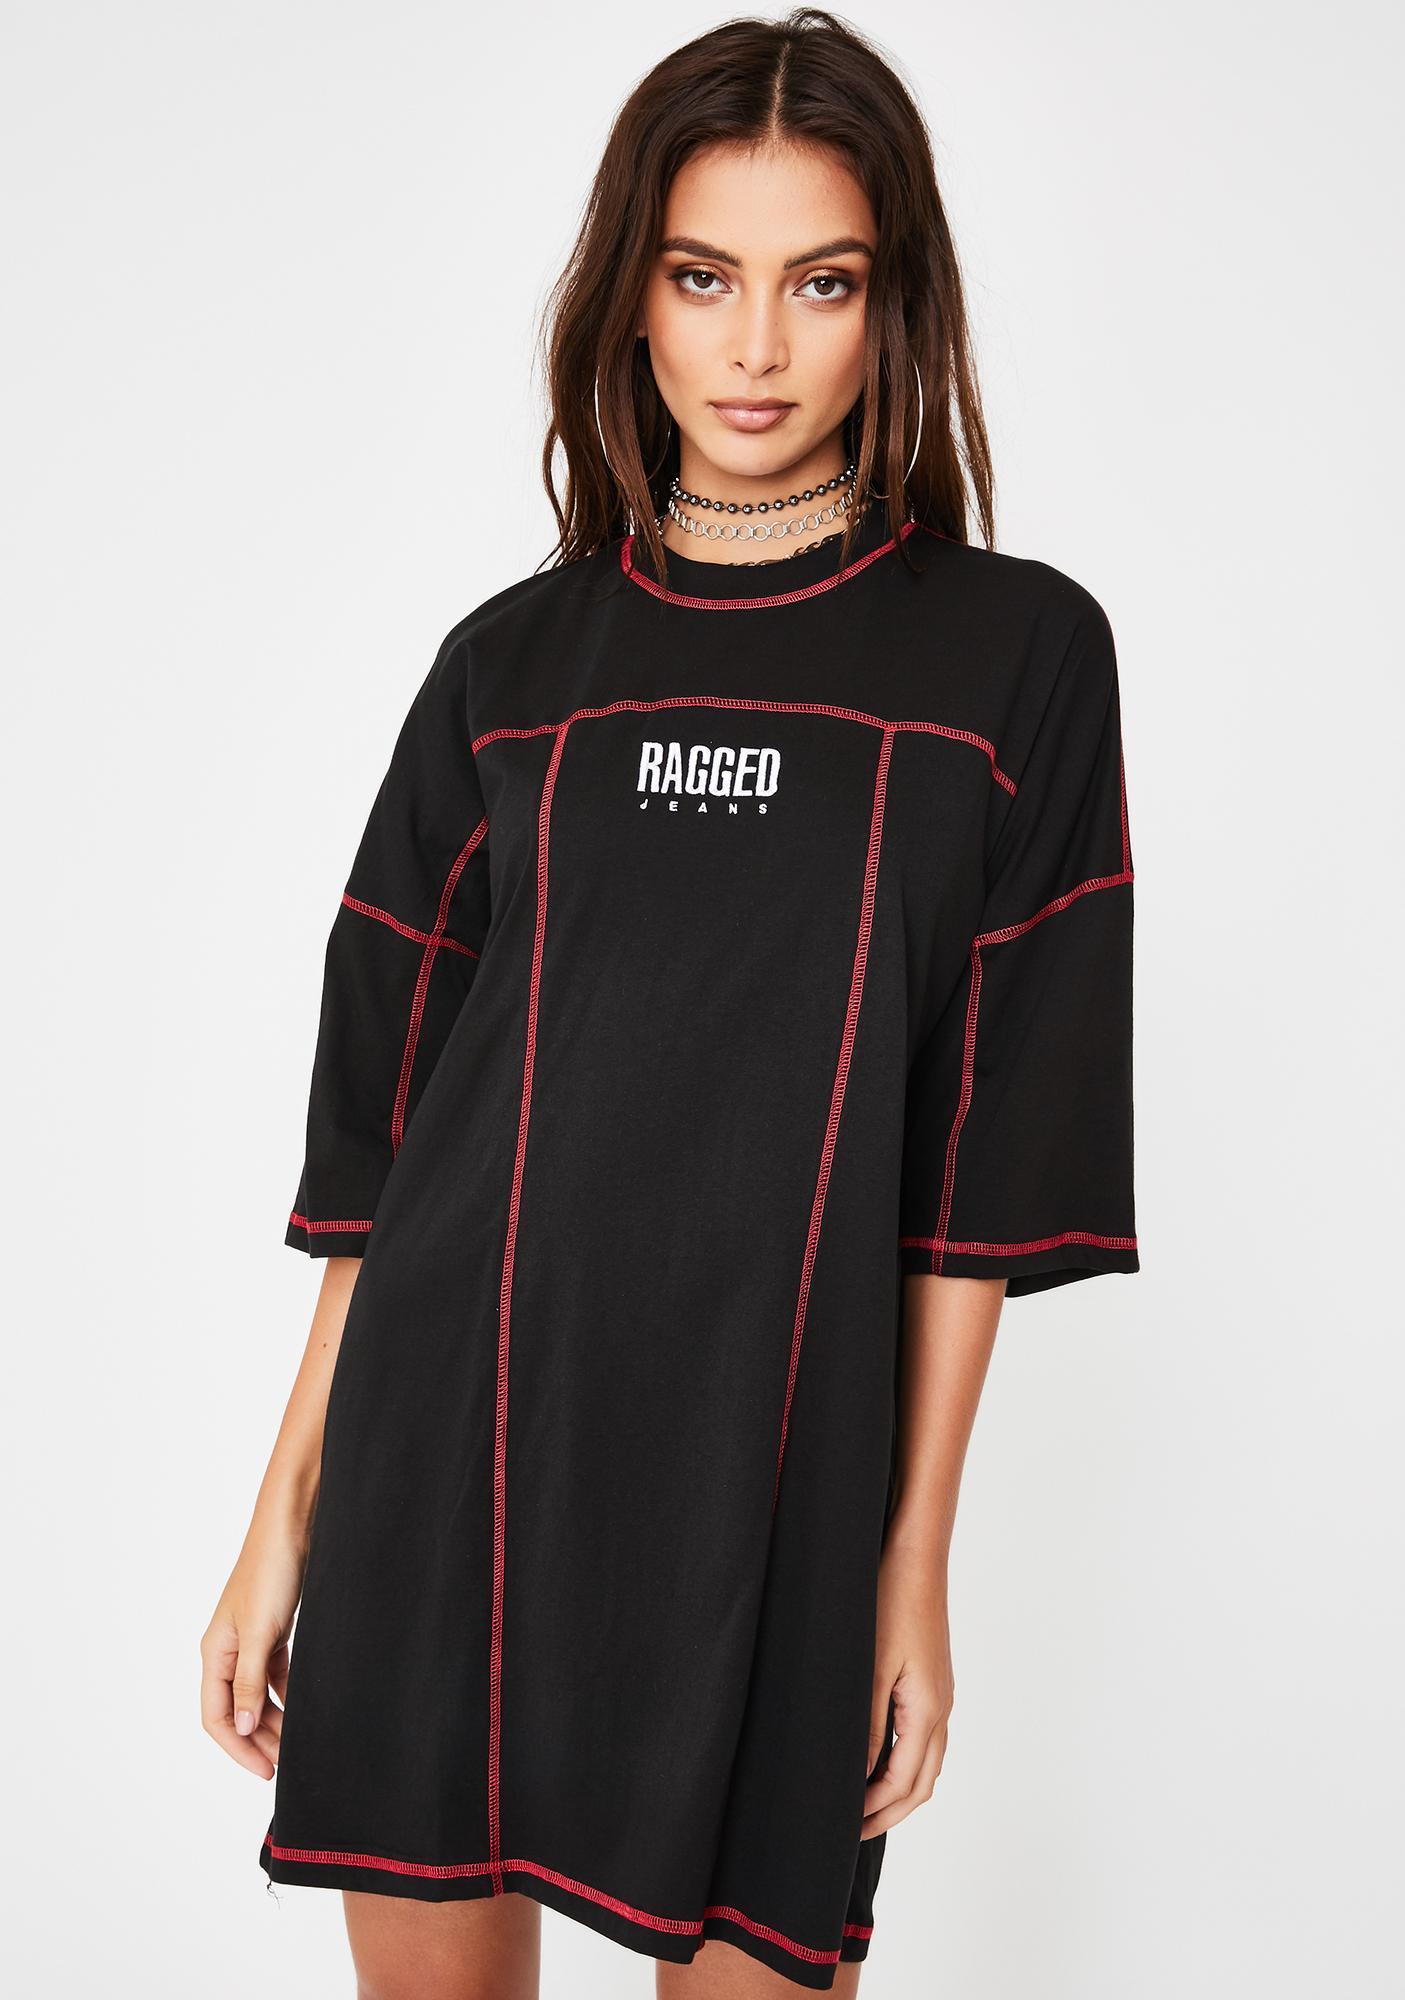 The Ragged Priest Infra Skater Tee Dress